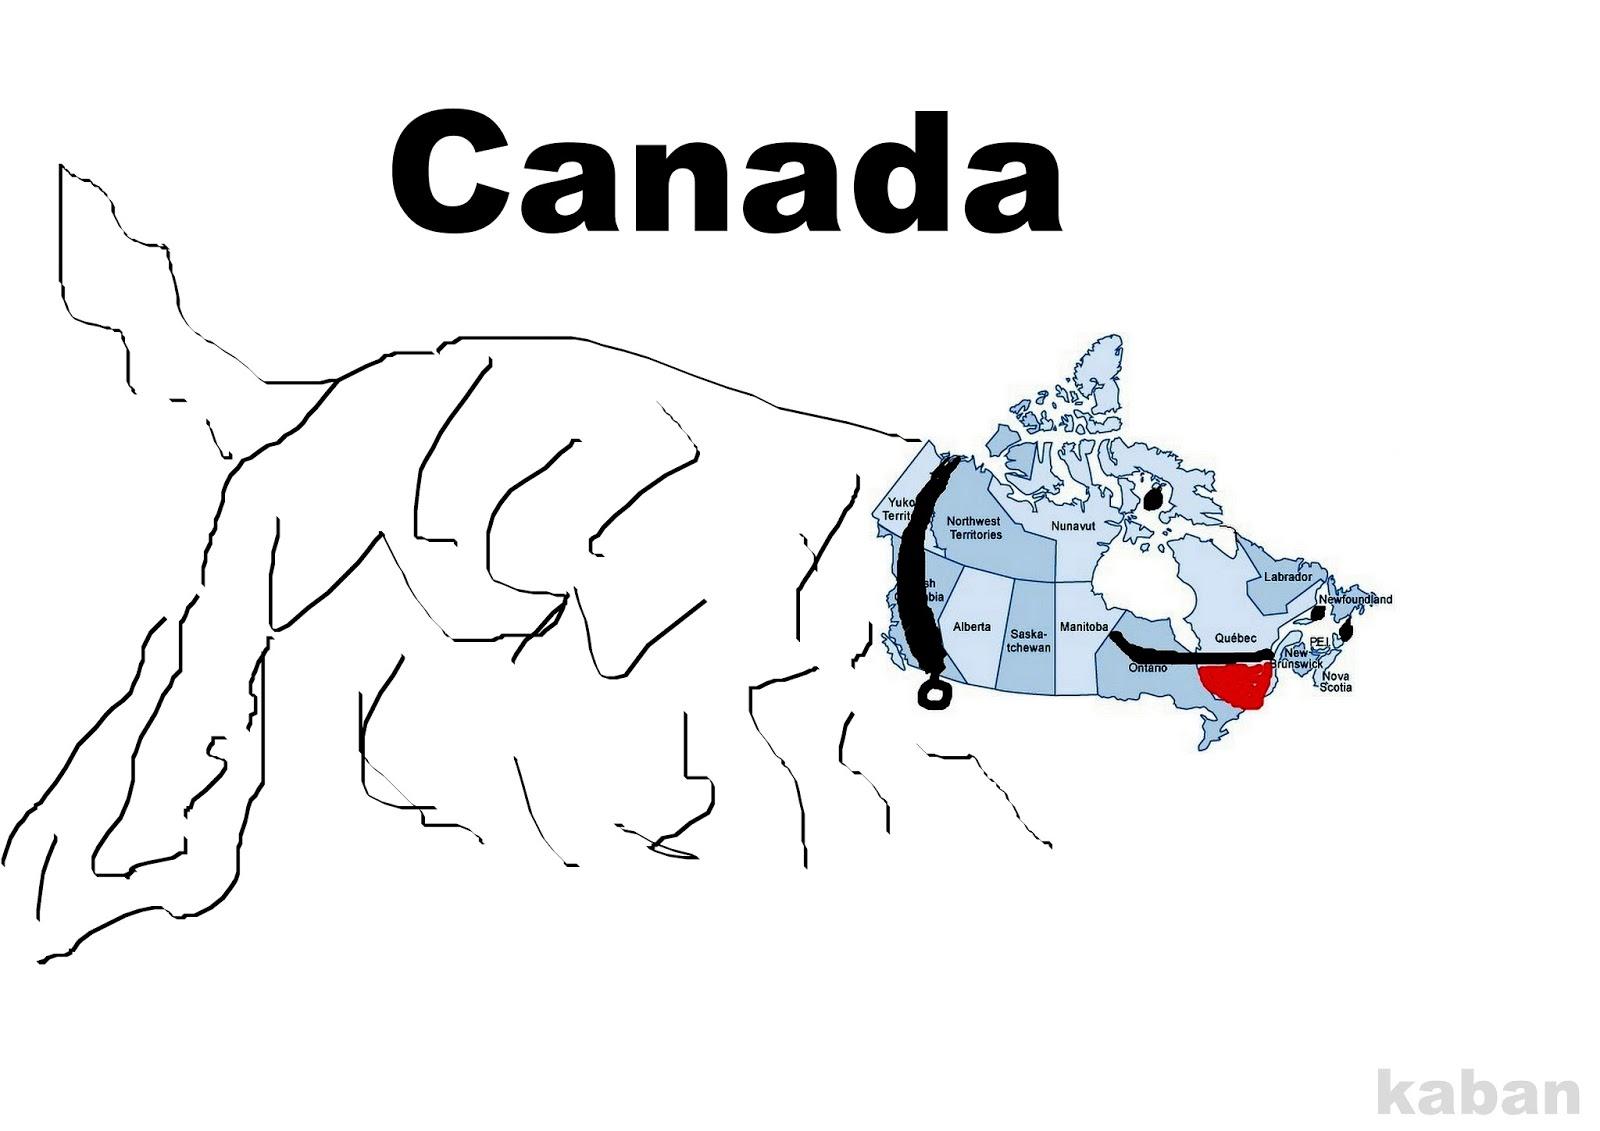 Funny Map Of Canada Funny maps: Funny map of Canada